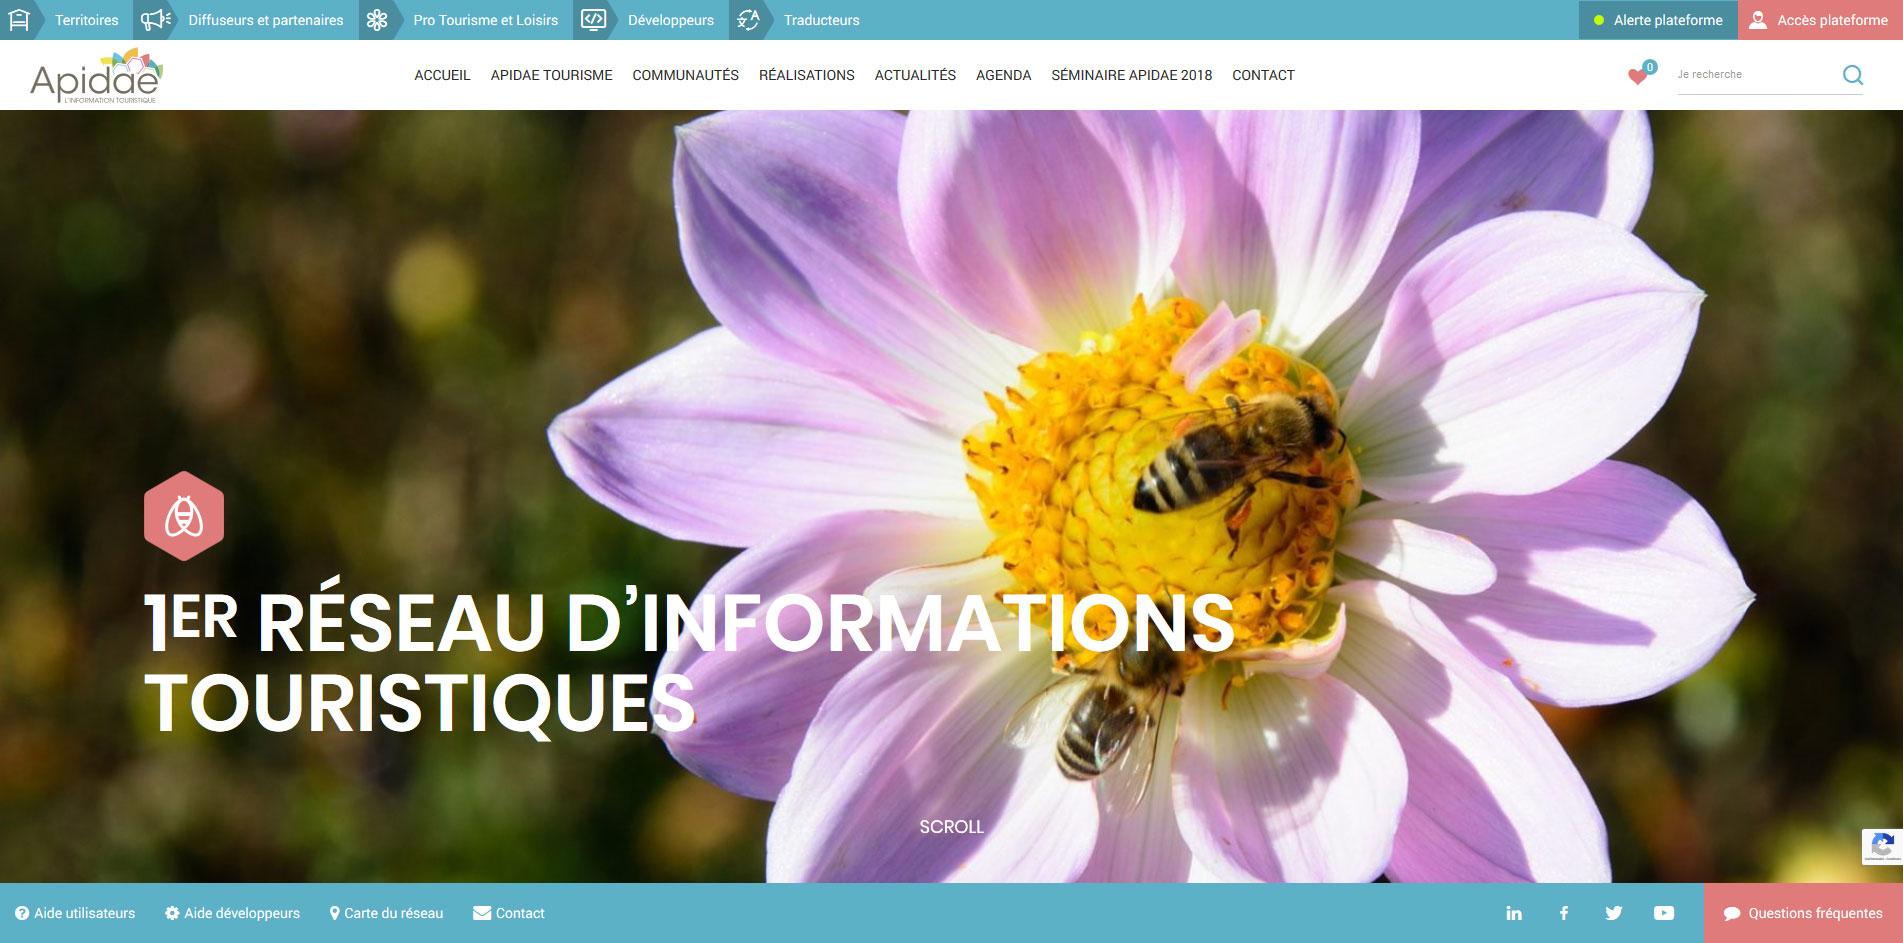 Apidae Tourisme | Accueil